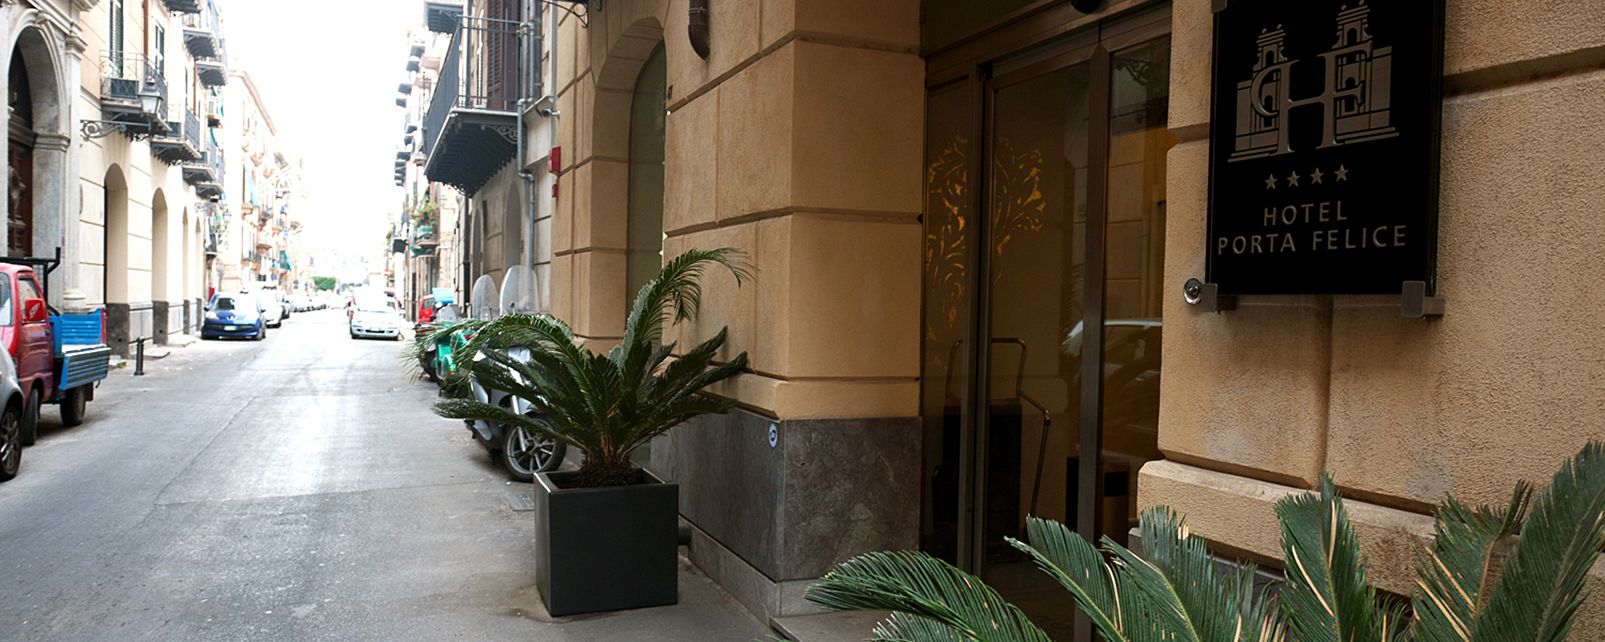 Hôtel Porta Felice